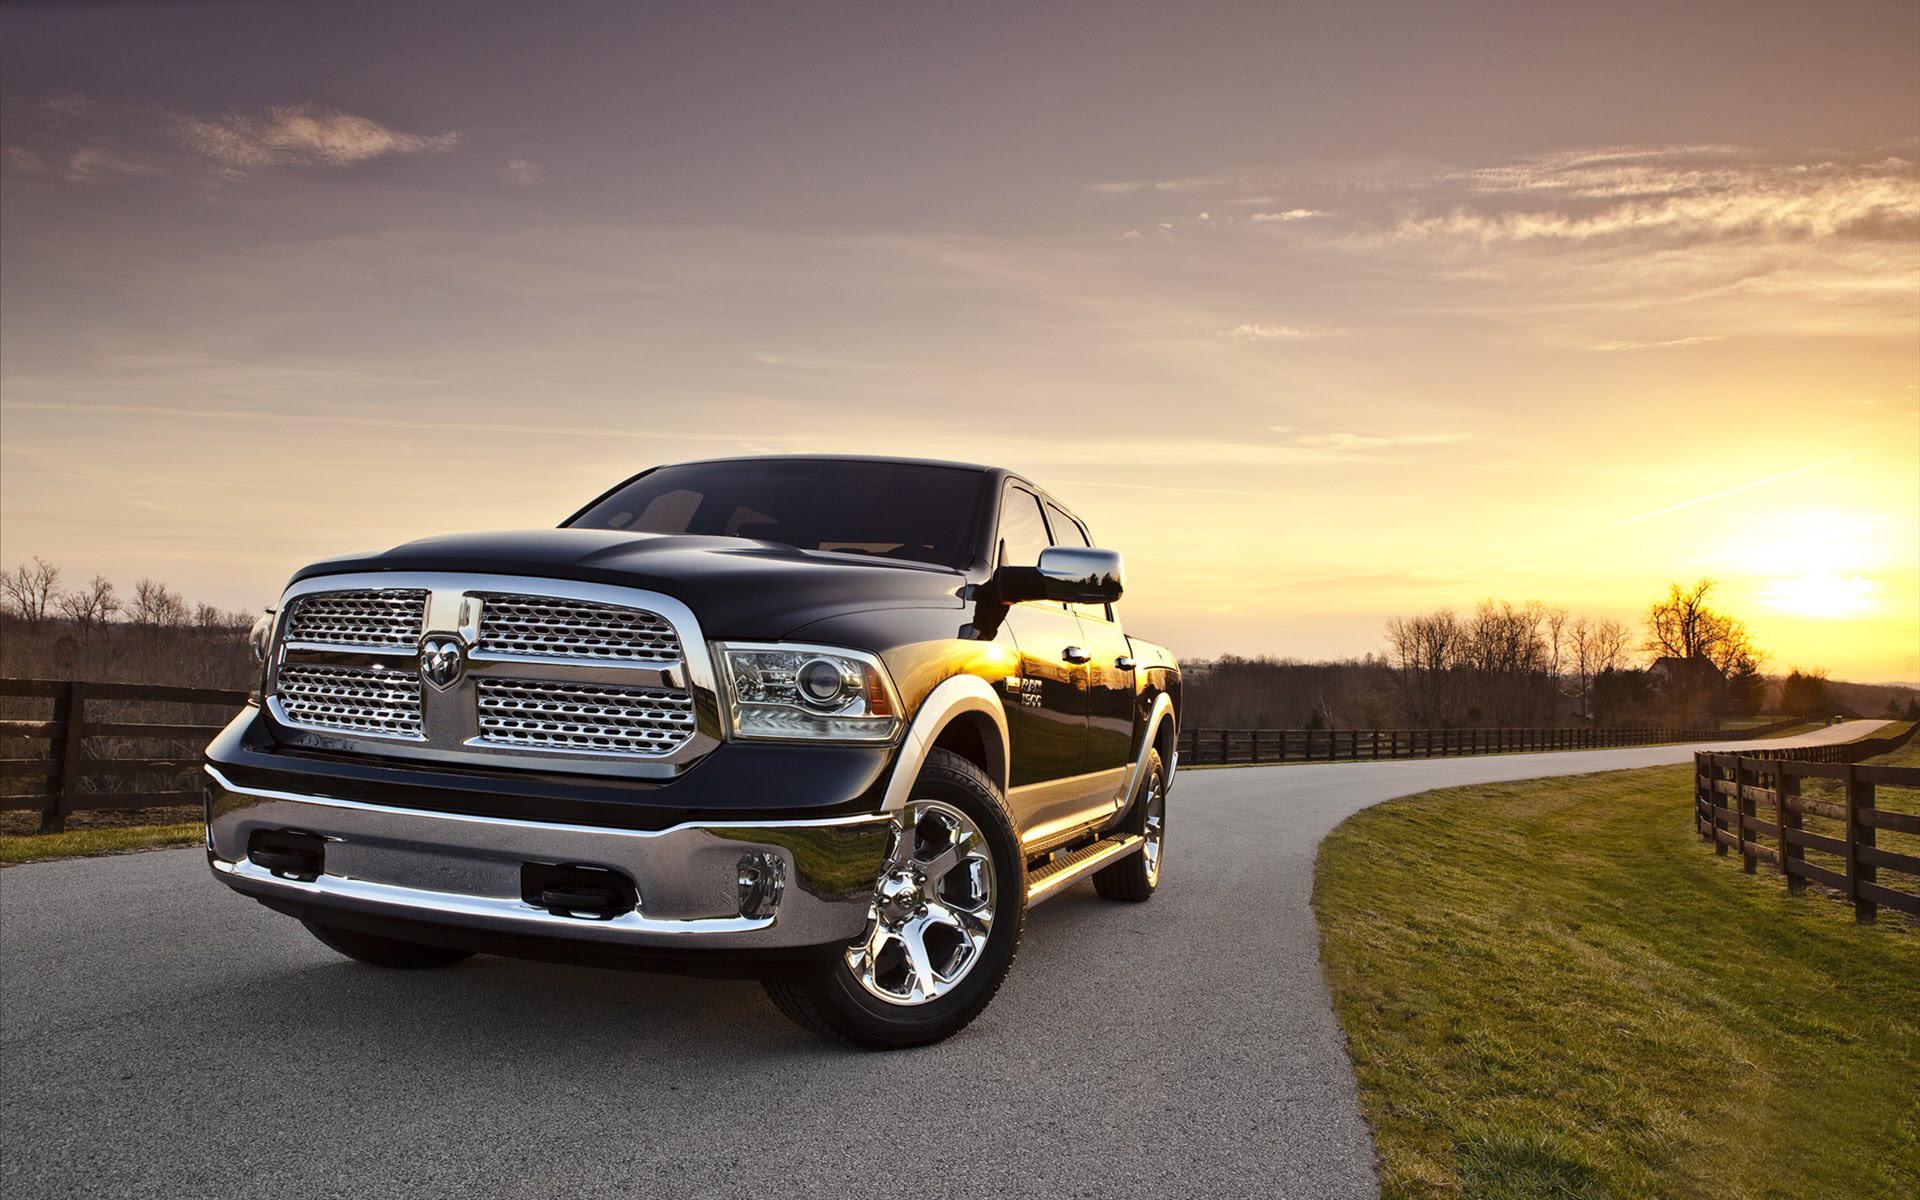 2013 Dodge Ram 1500 Wallpaper | HD Car Wallpapers